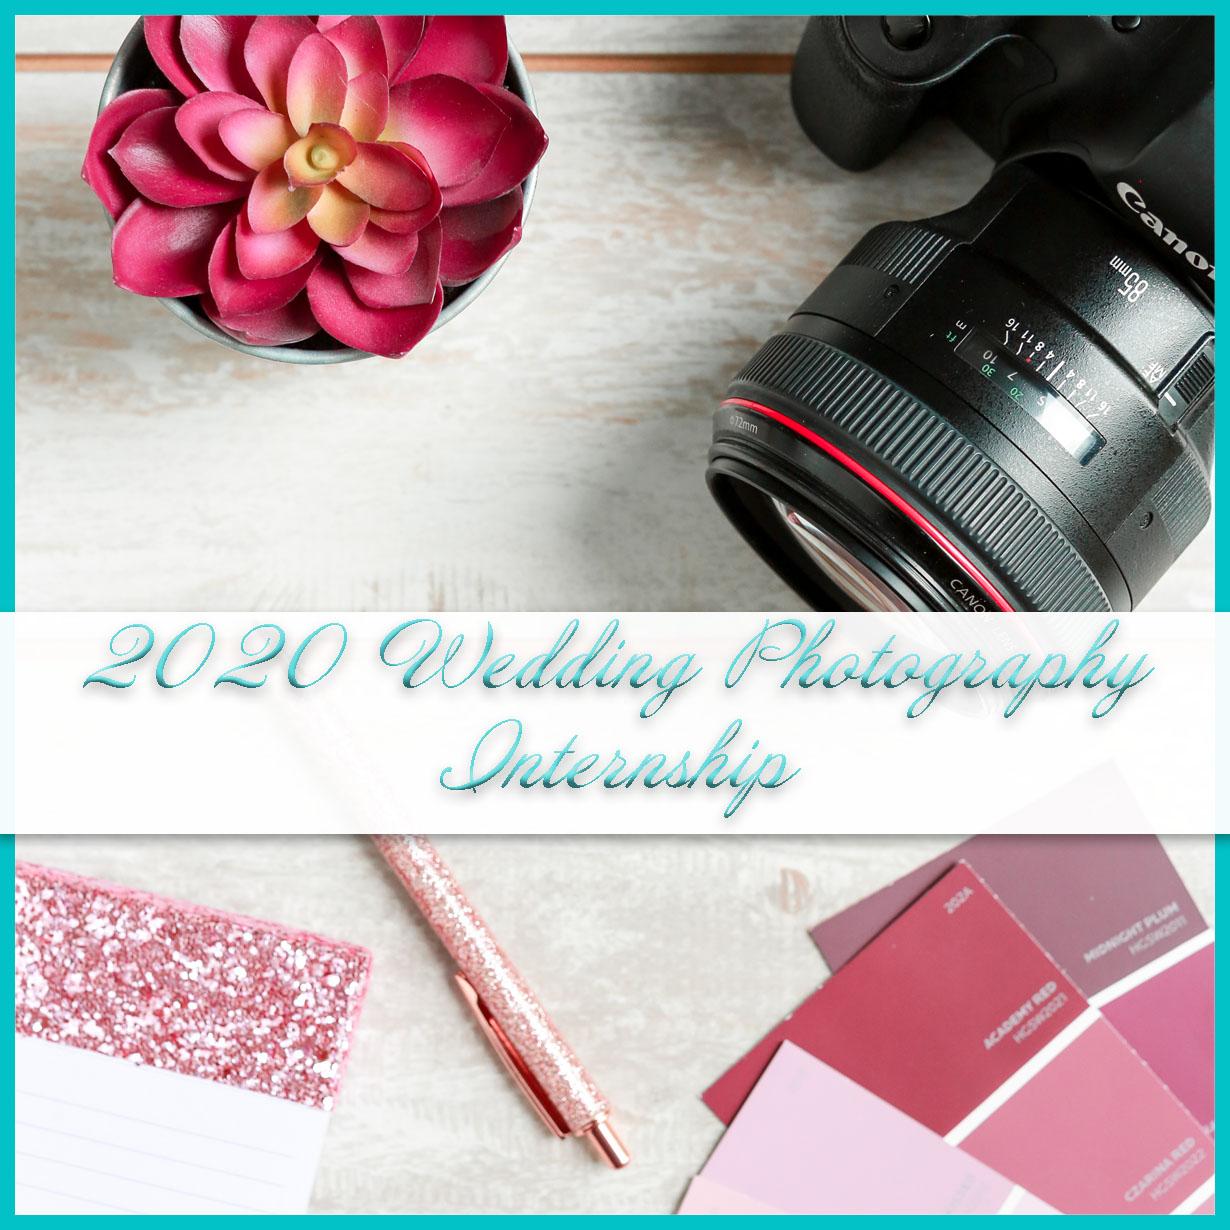 Wedding Photography Internship